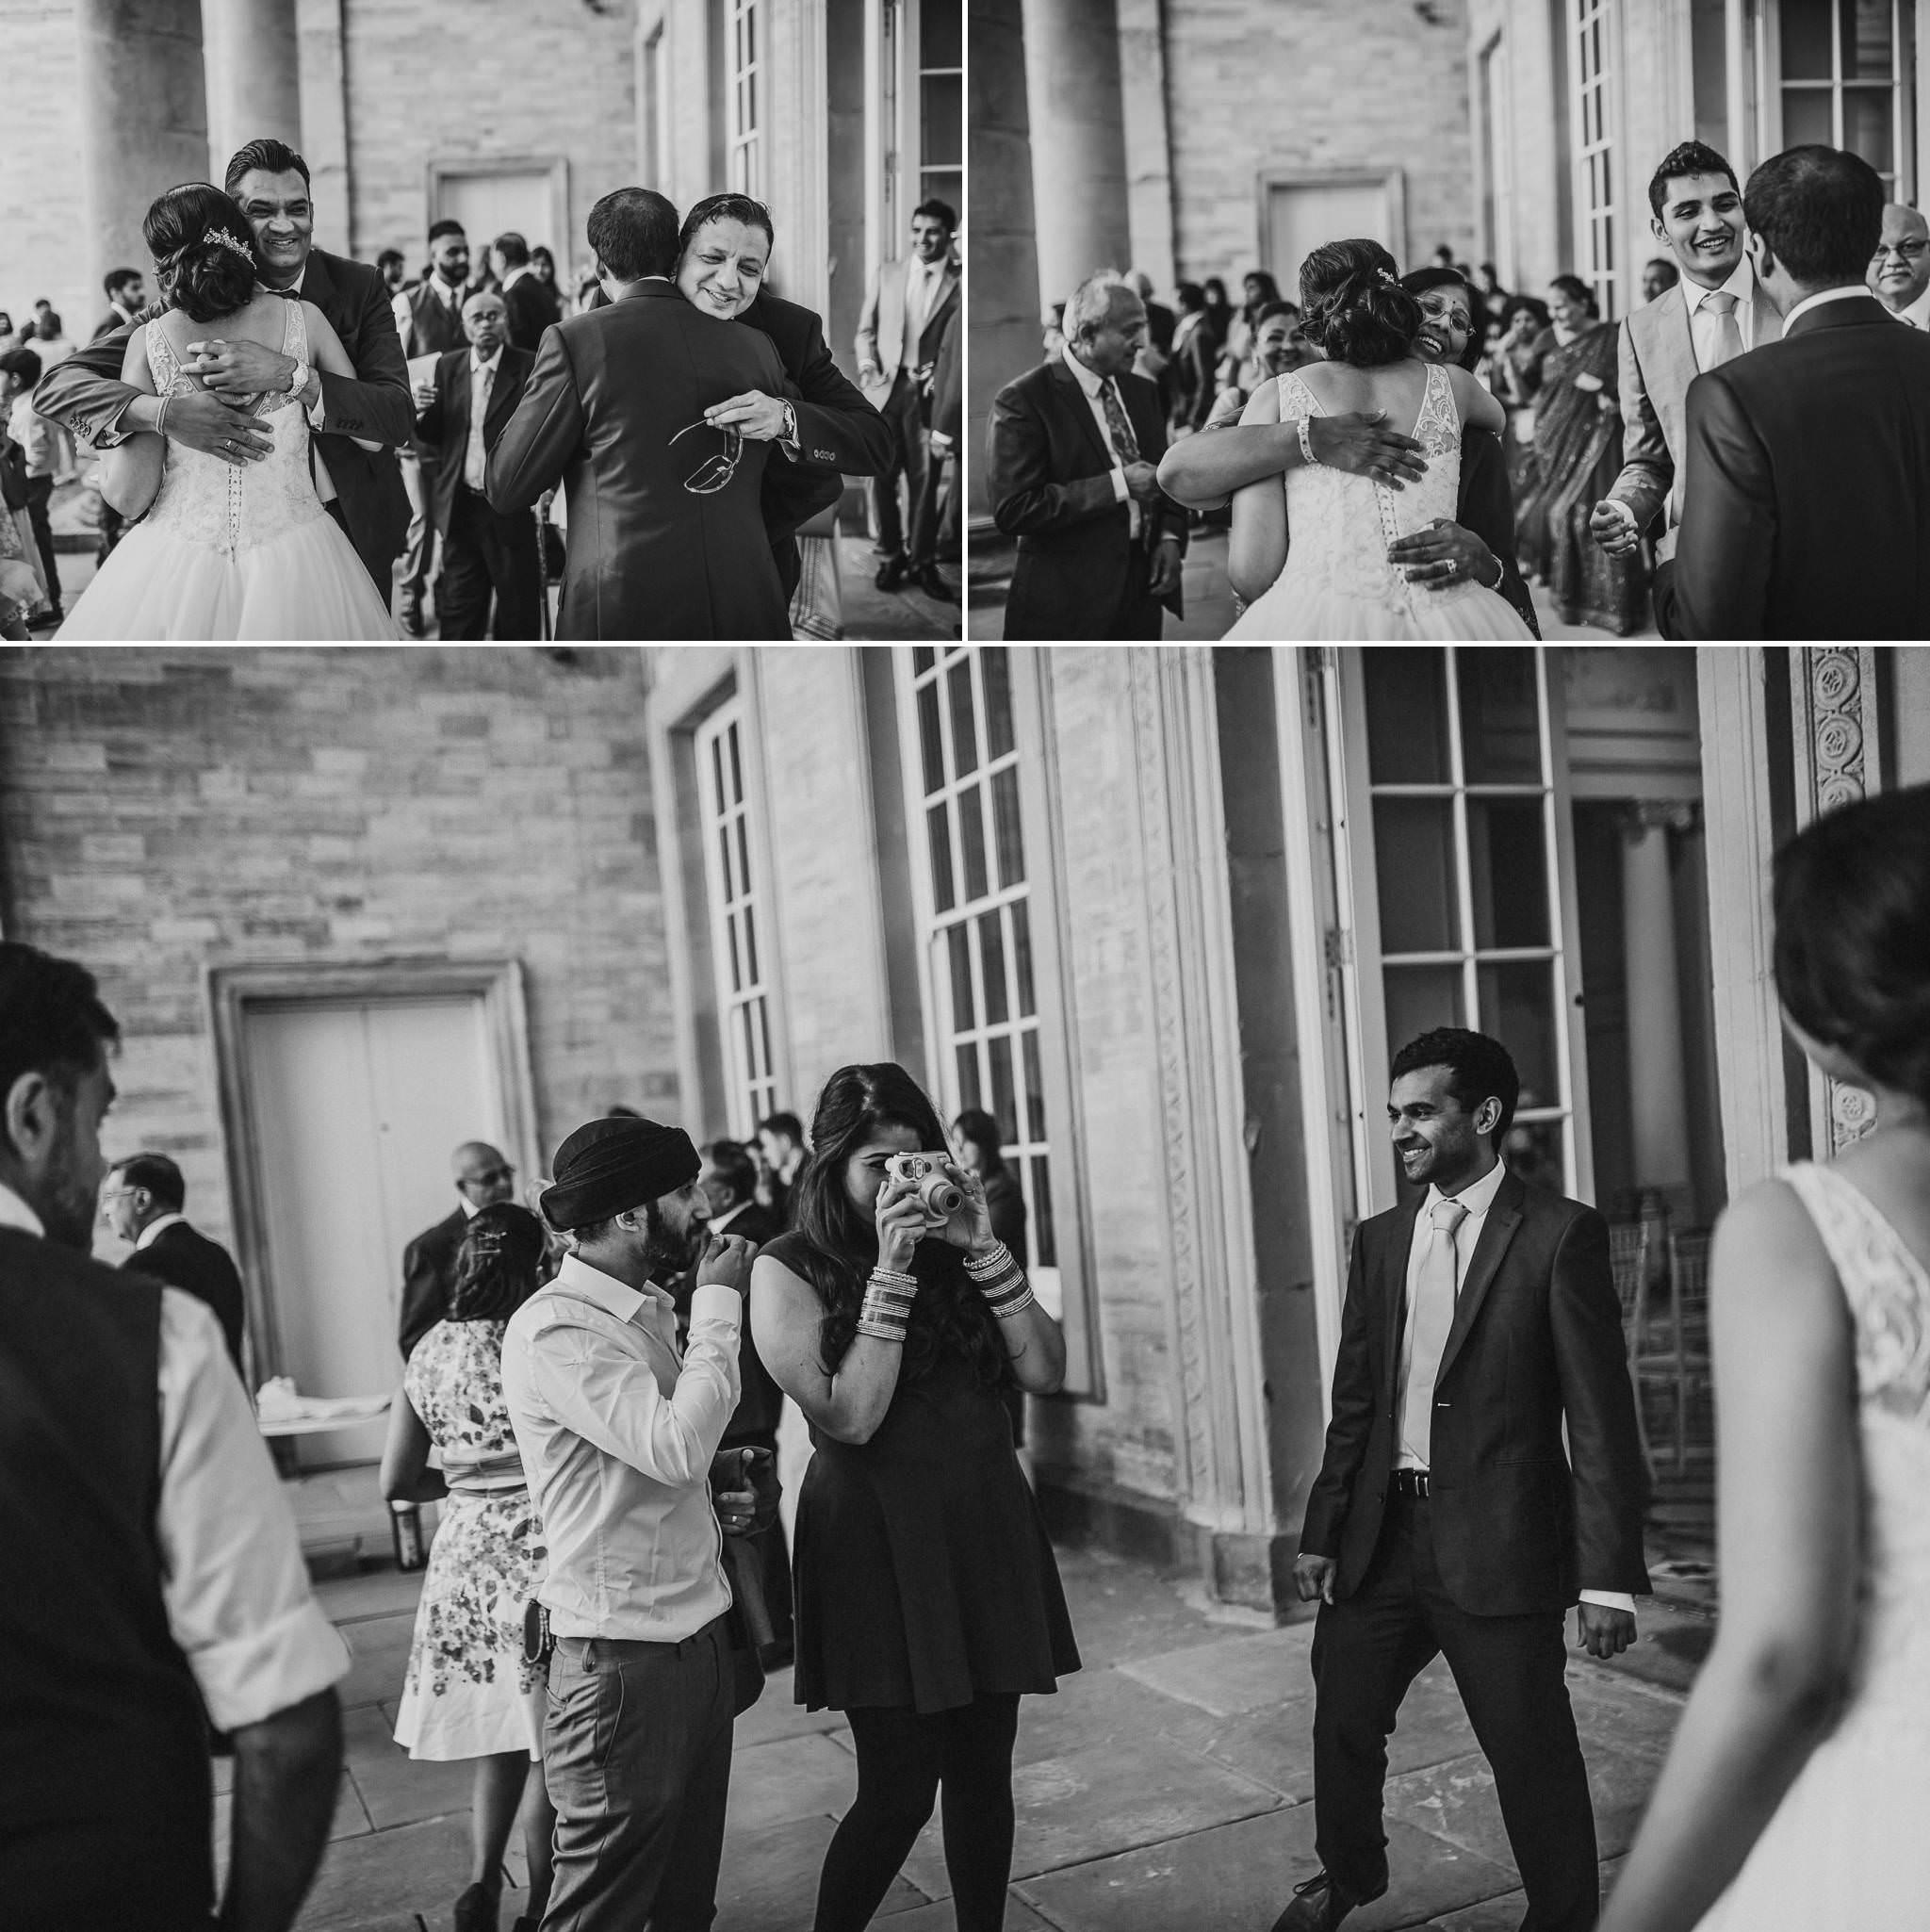 compton-verney-wedding-photos 18.jpg